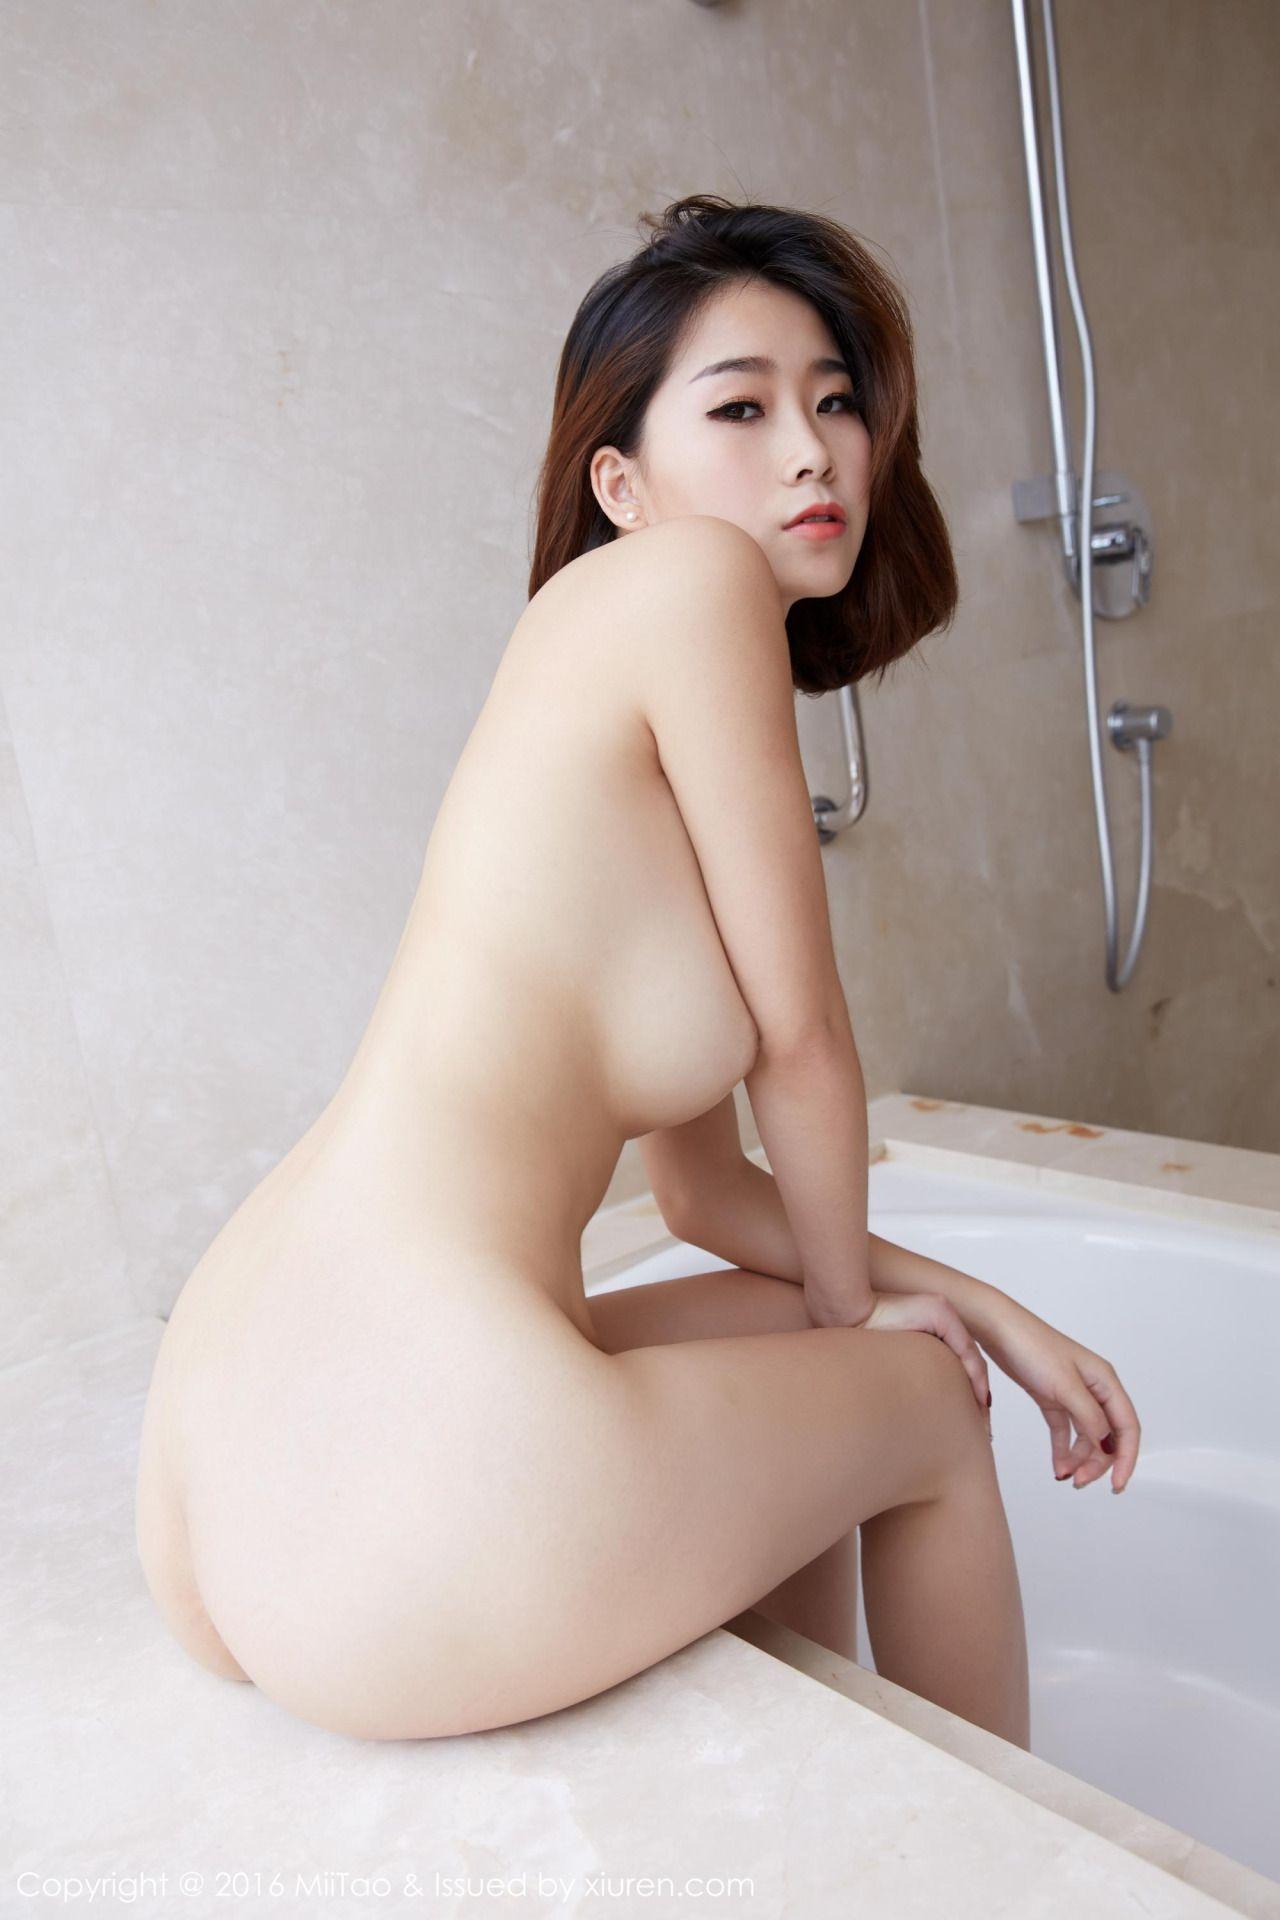 Lesbian asian girls tight pussy